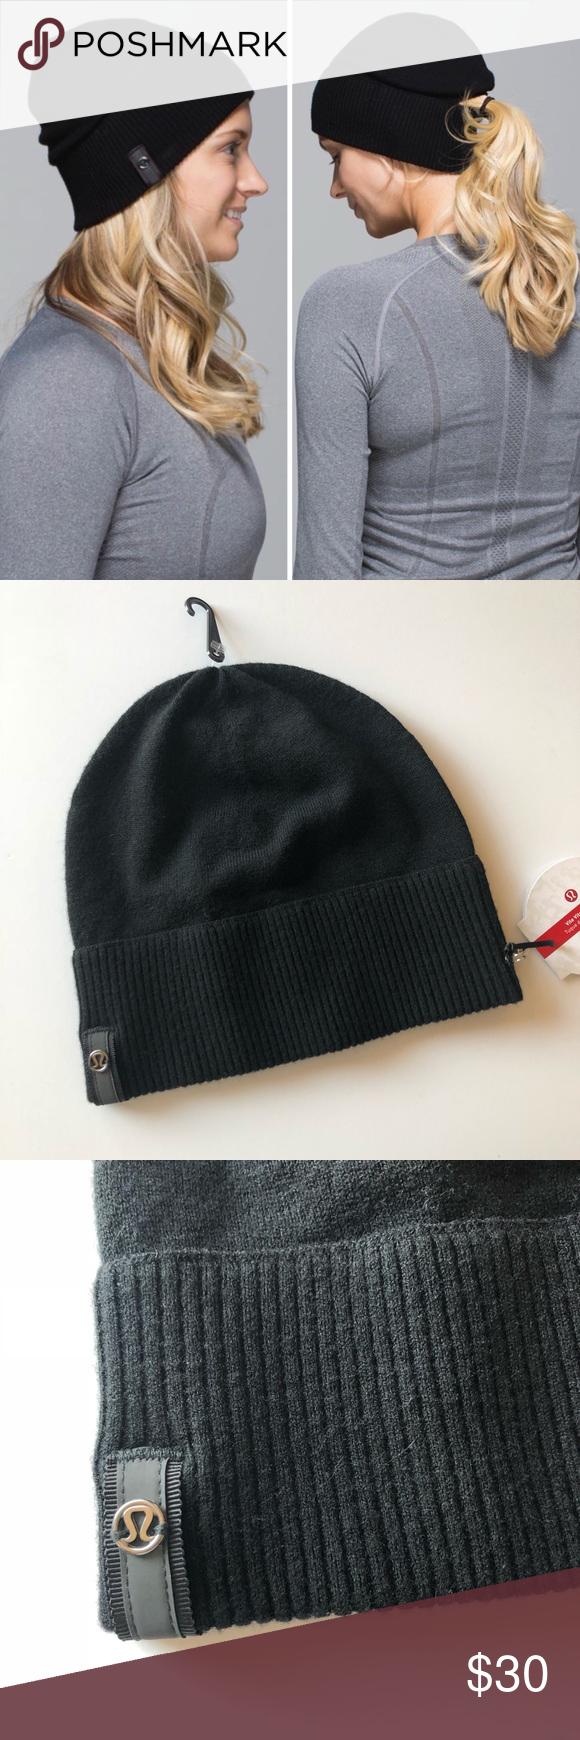 e63c71b688f Lululemon Vite Vite Run Toque ponytail beanie Lululemon black running hat  with an opening for a ponytail